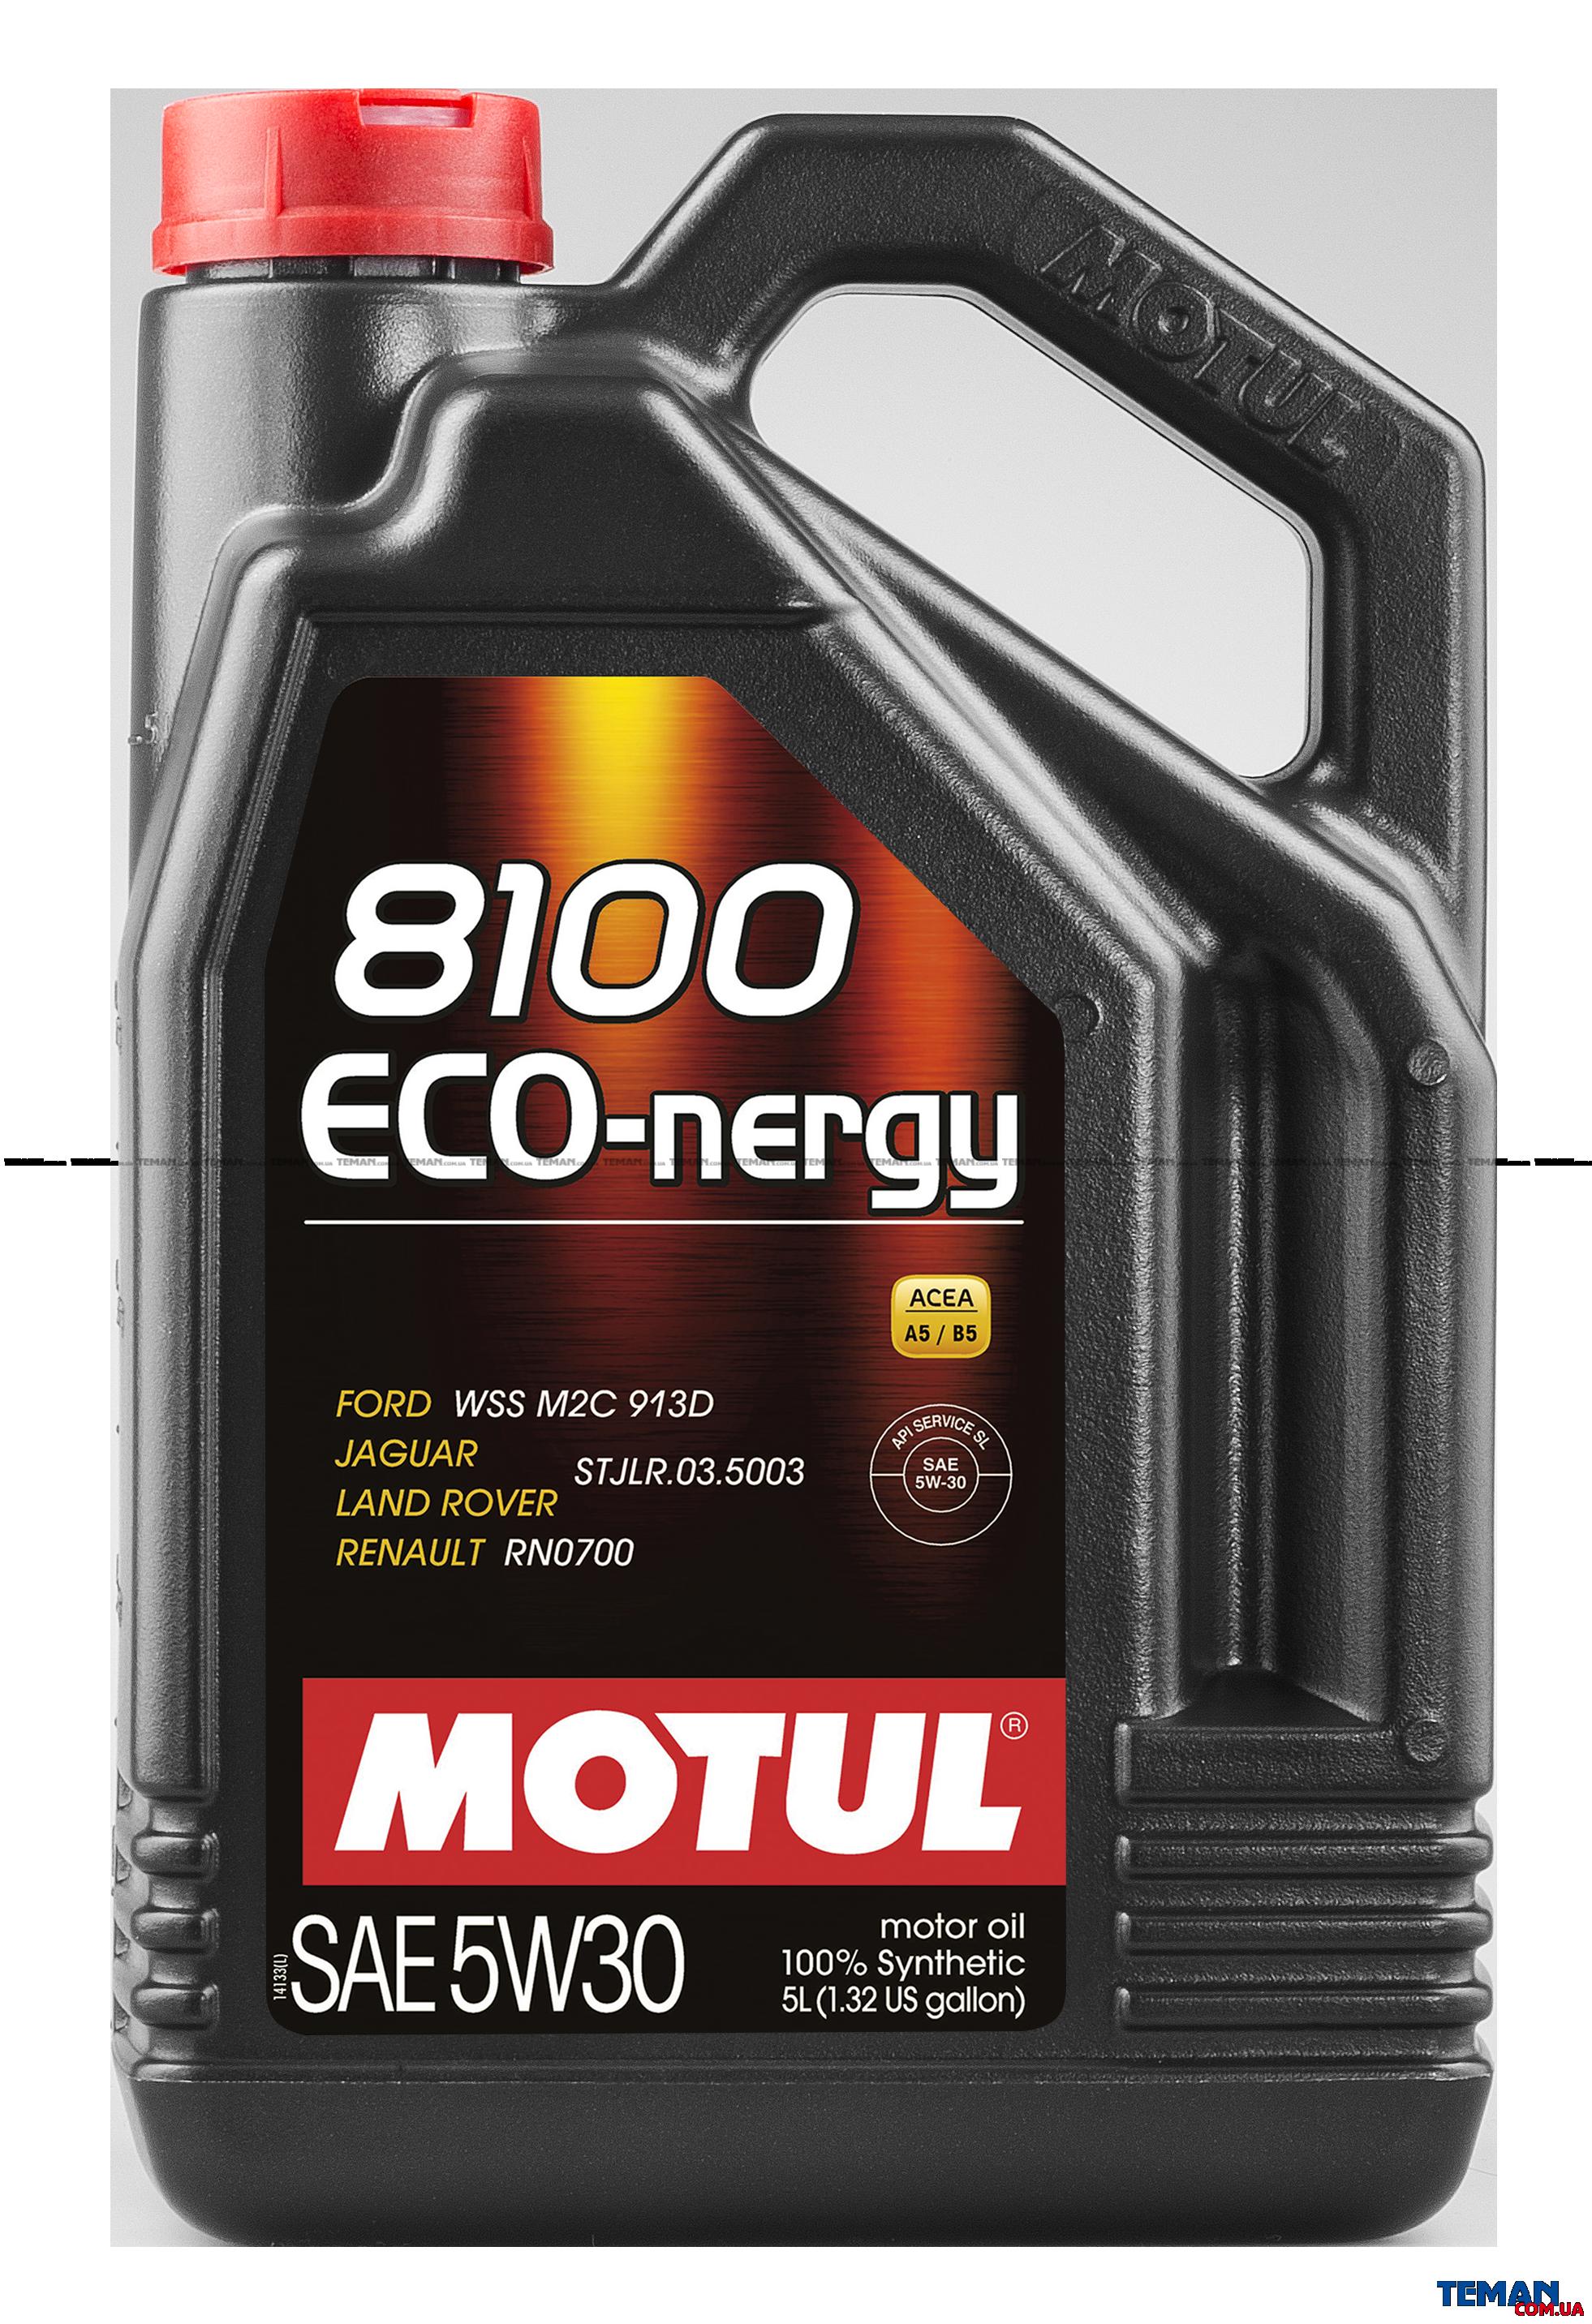 Синтетическое моторное масло 8100 Eco-nergy SAE 5W30, 5 л